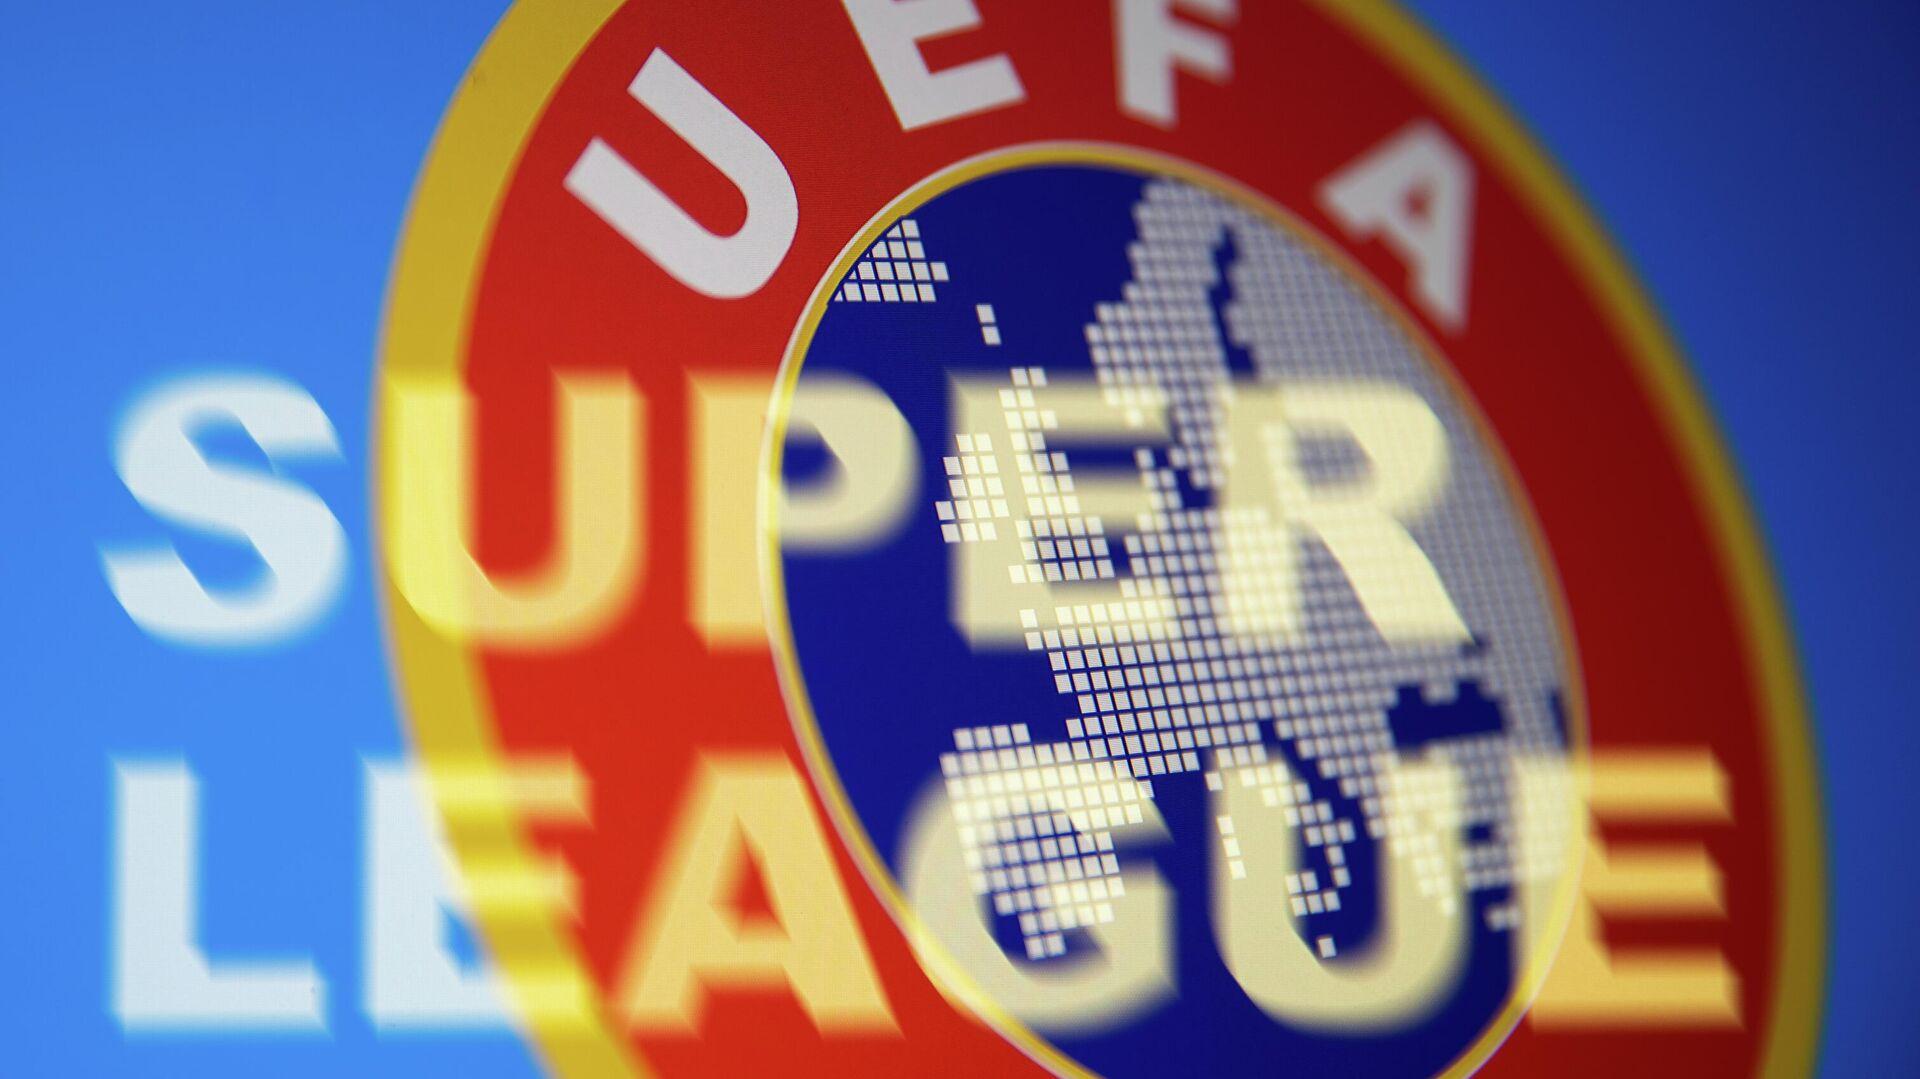 Superliga y el logo de la UEFA - Sputnik Mundo, 1920, 20.04.2021